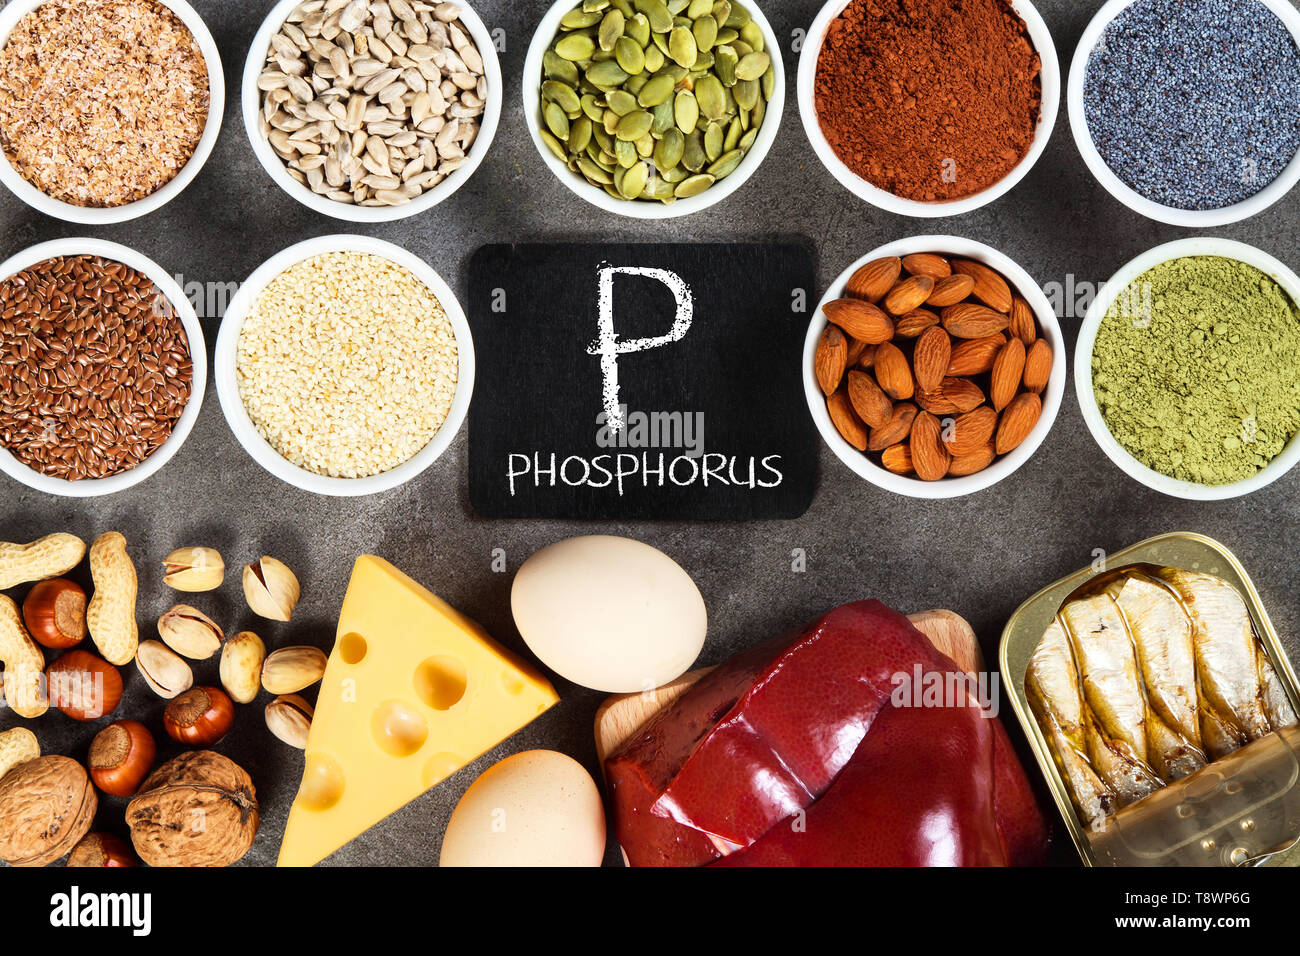 Organic phosphorus sources. Foods highest in phosphorus. - Stock Image